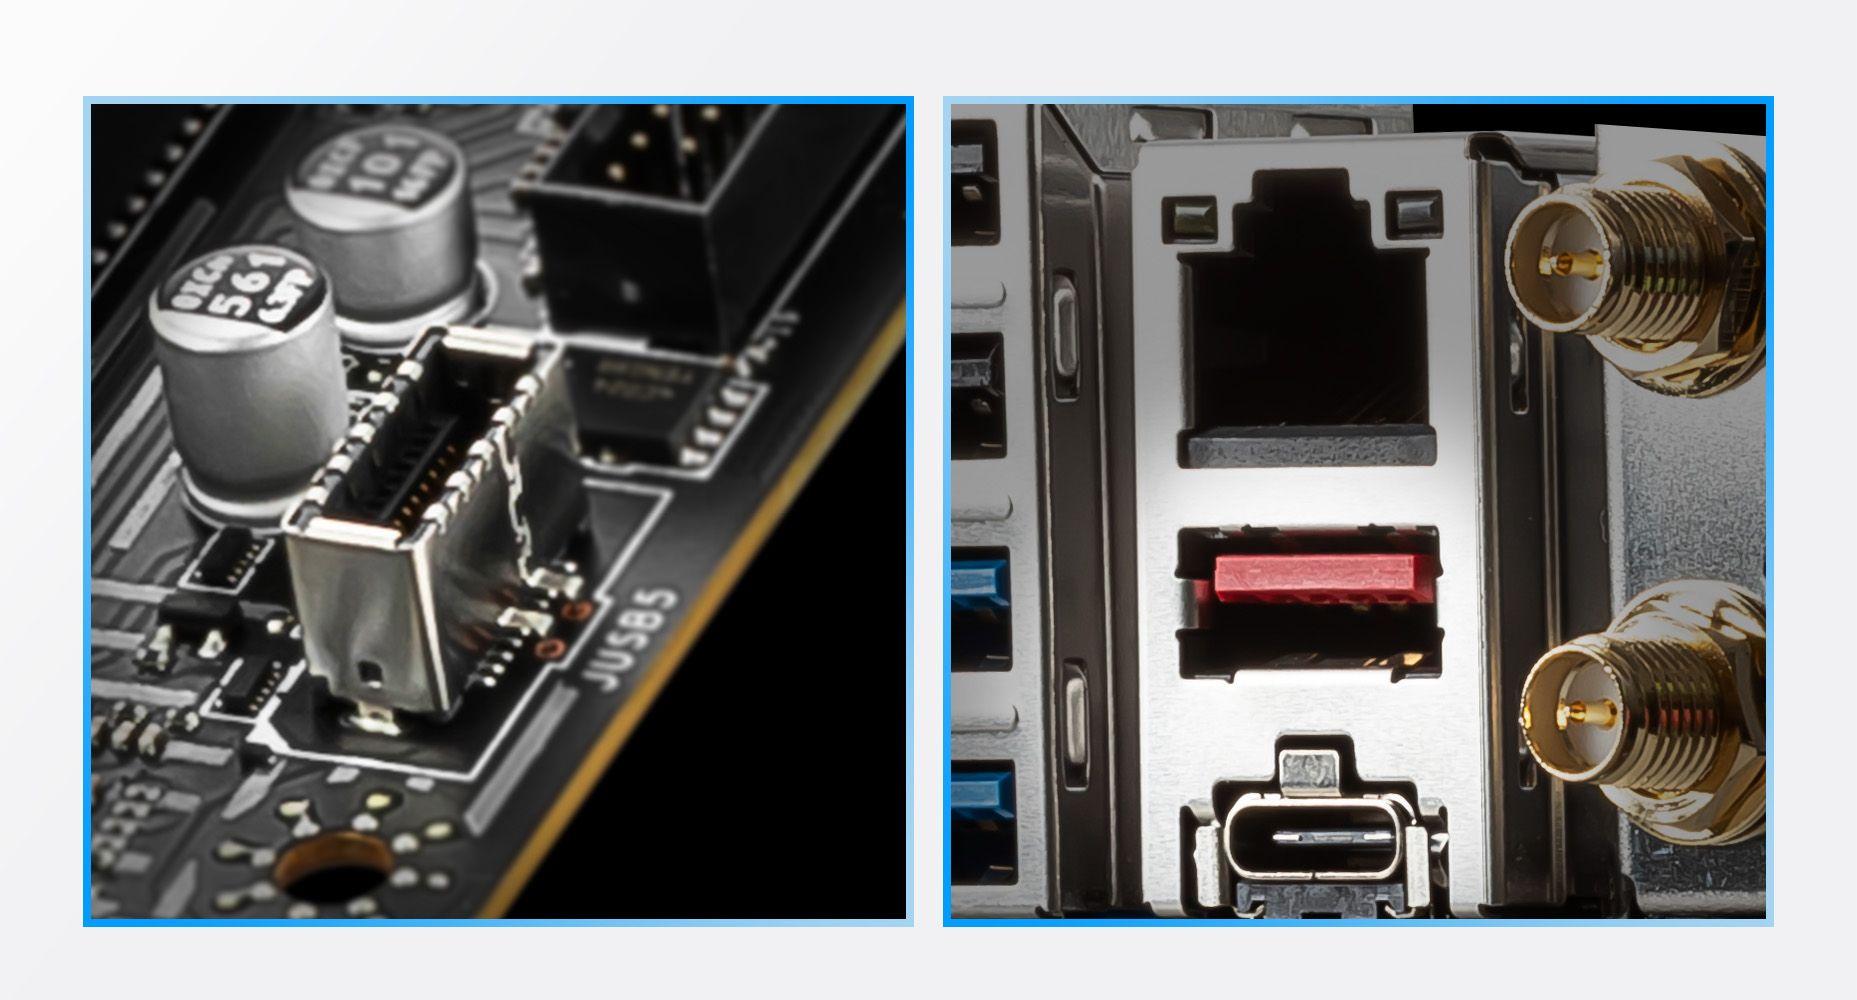 MSI Z590 PRO WIFI USB Type-C ready in both Front case panel & Rear IO